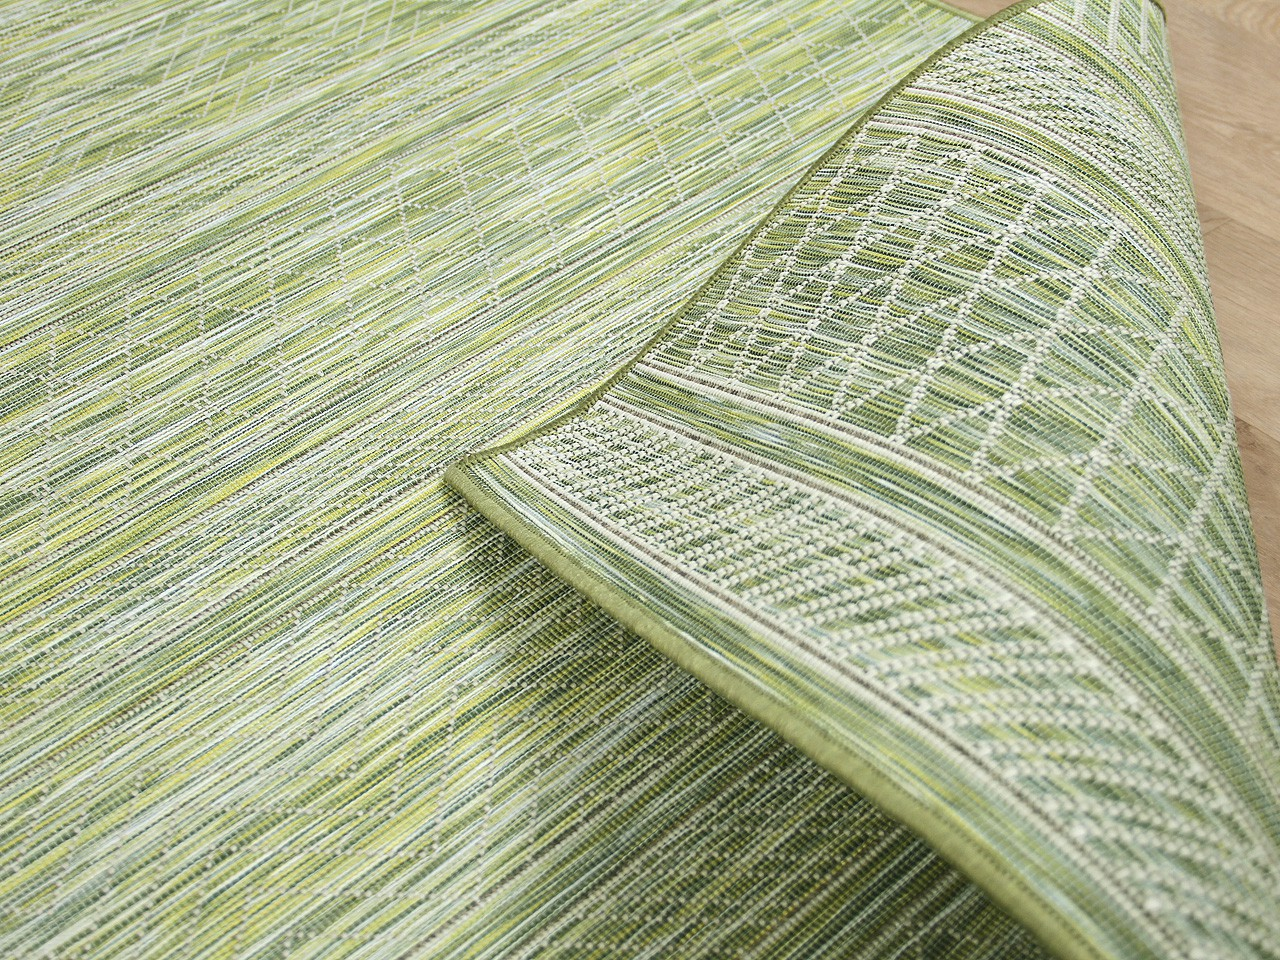 in outdoor teppich beidseitig flachgewebe hampton gr n. Black Bedroom Furniture Sets. Home Design Ideas